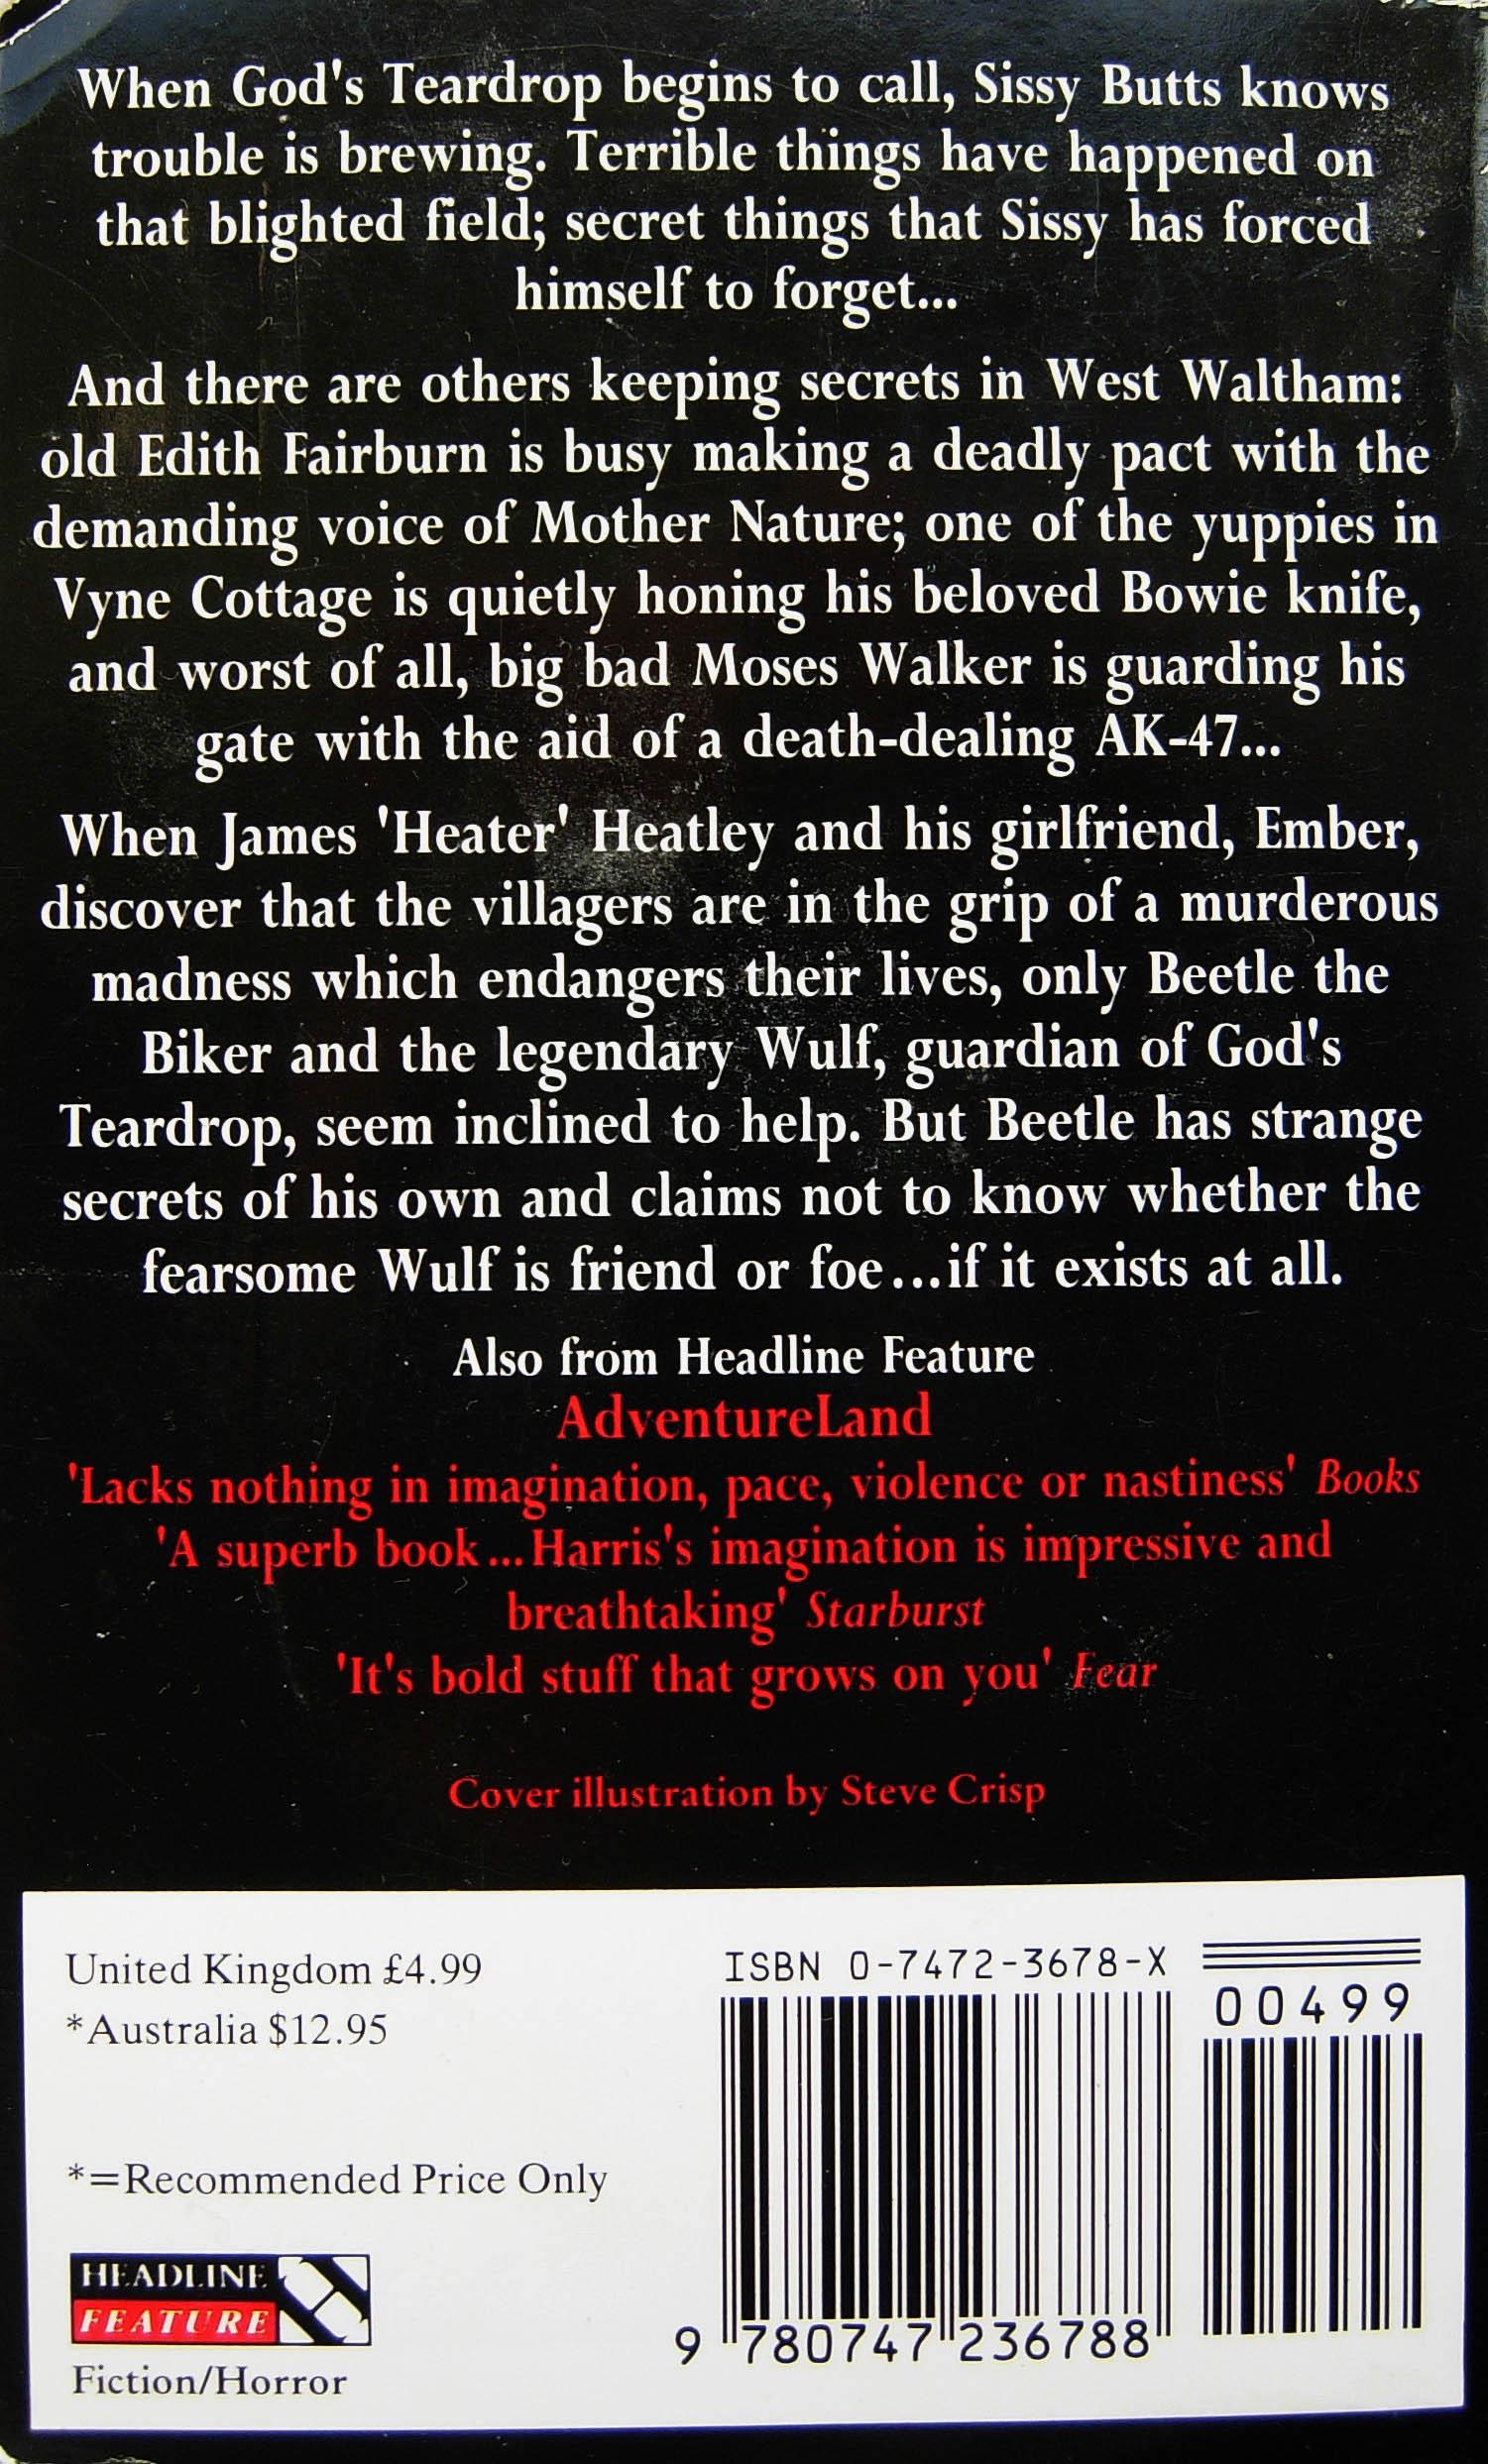 Paperback, Headline Book Publishing 1991